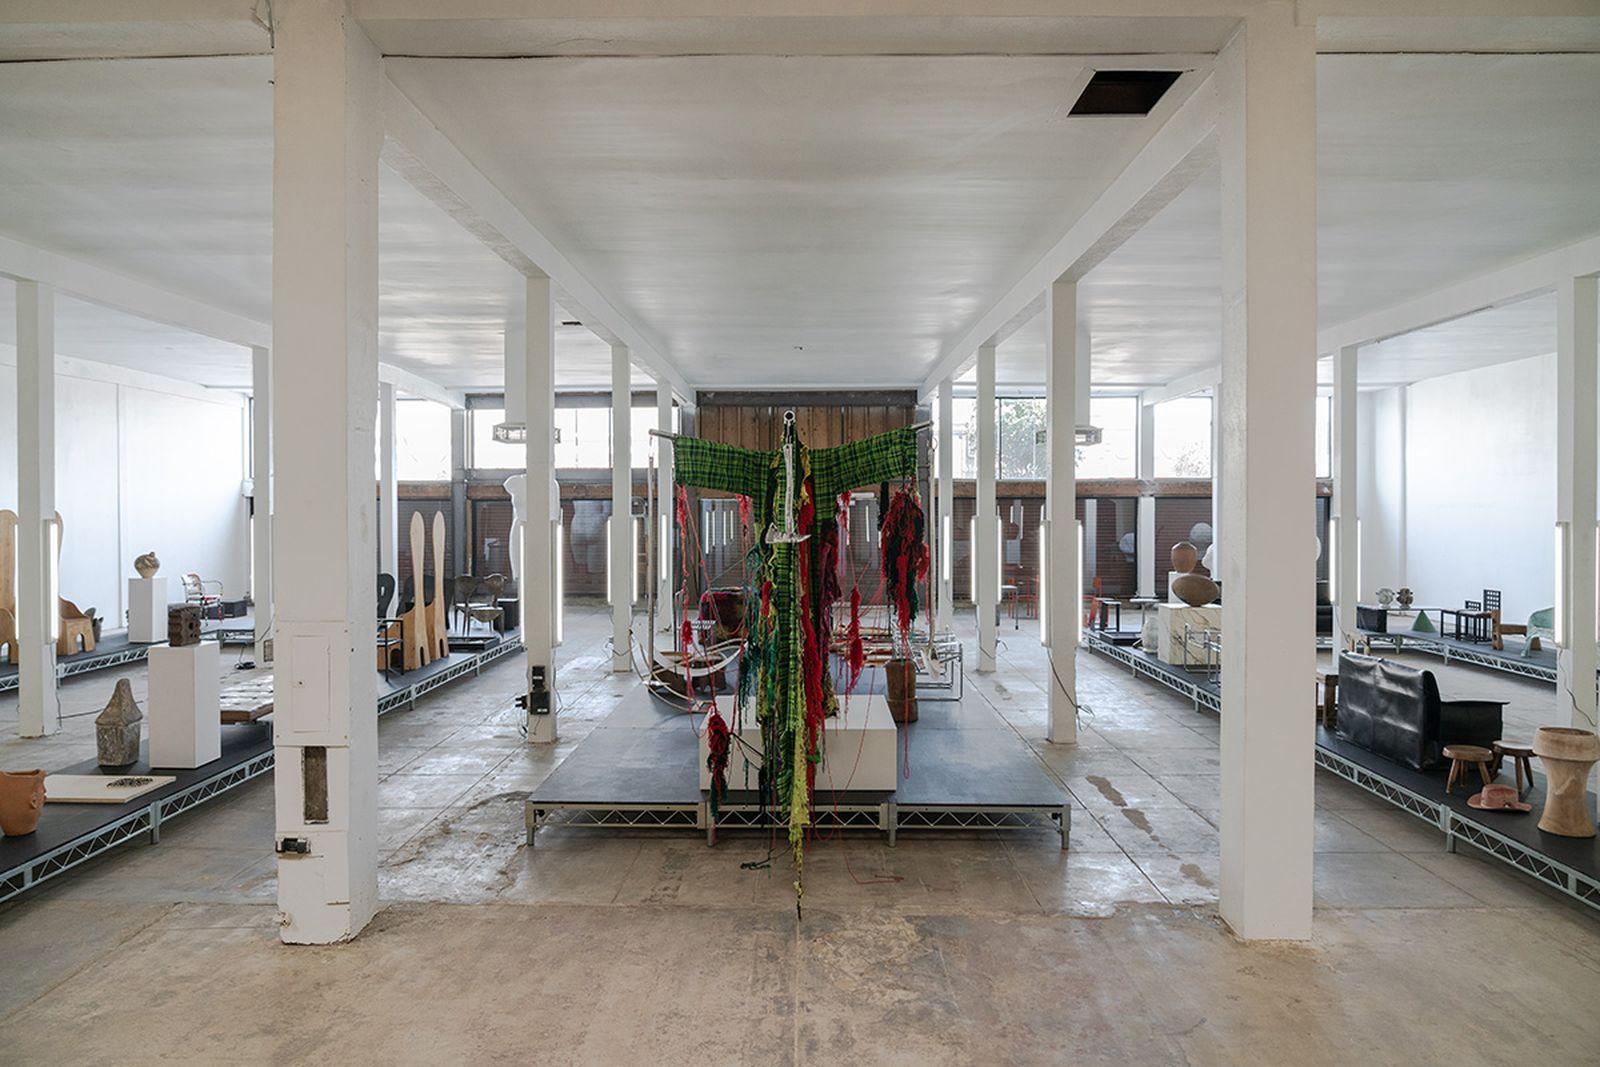 sized-los-angeles-exhibition-luka-sabbat-03